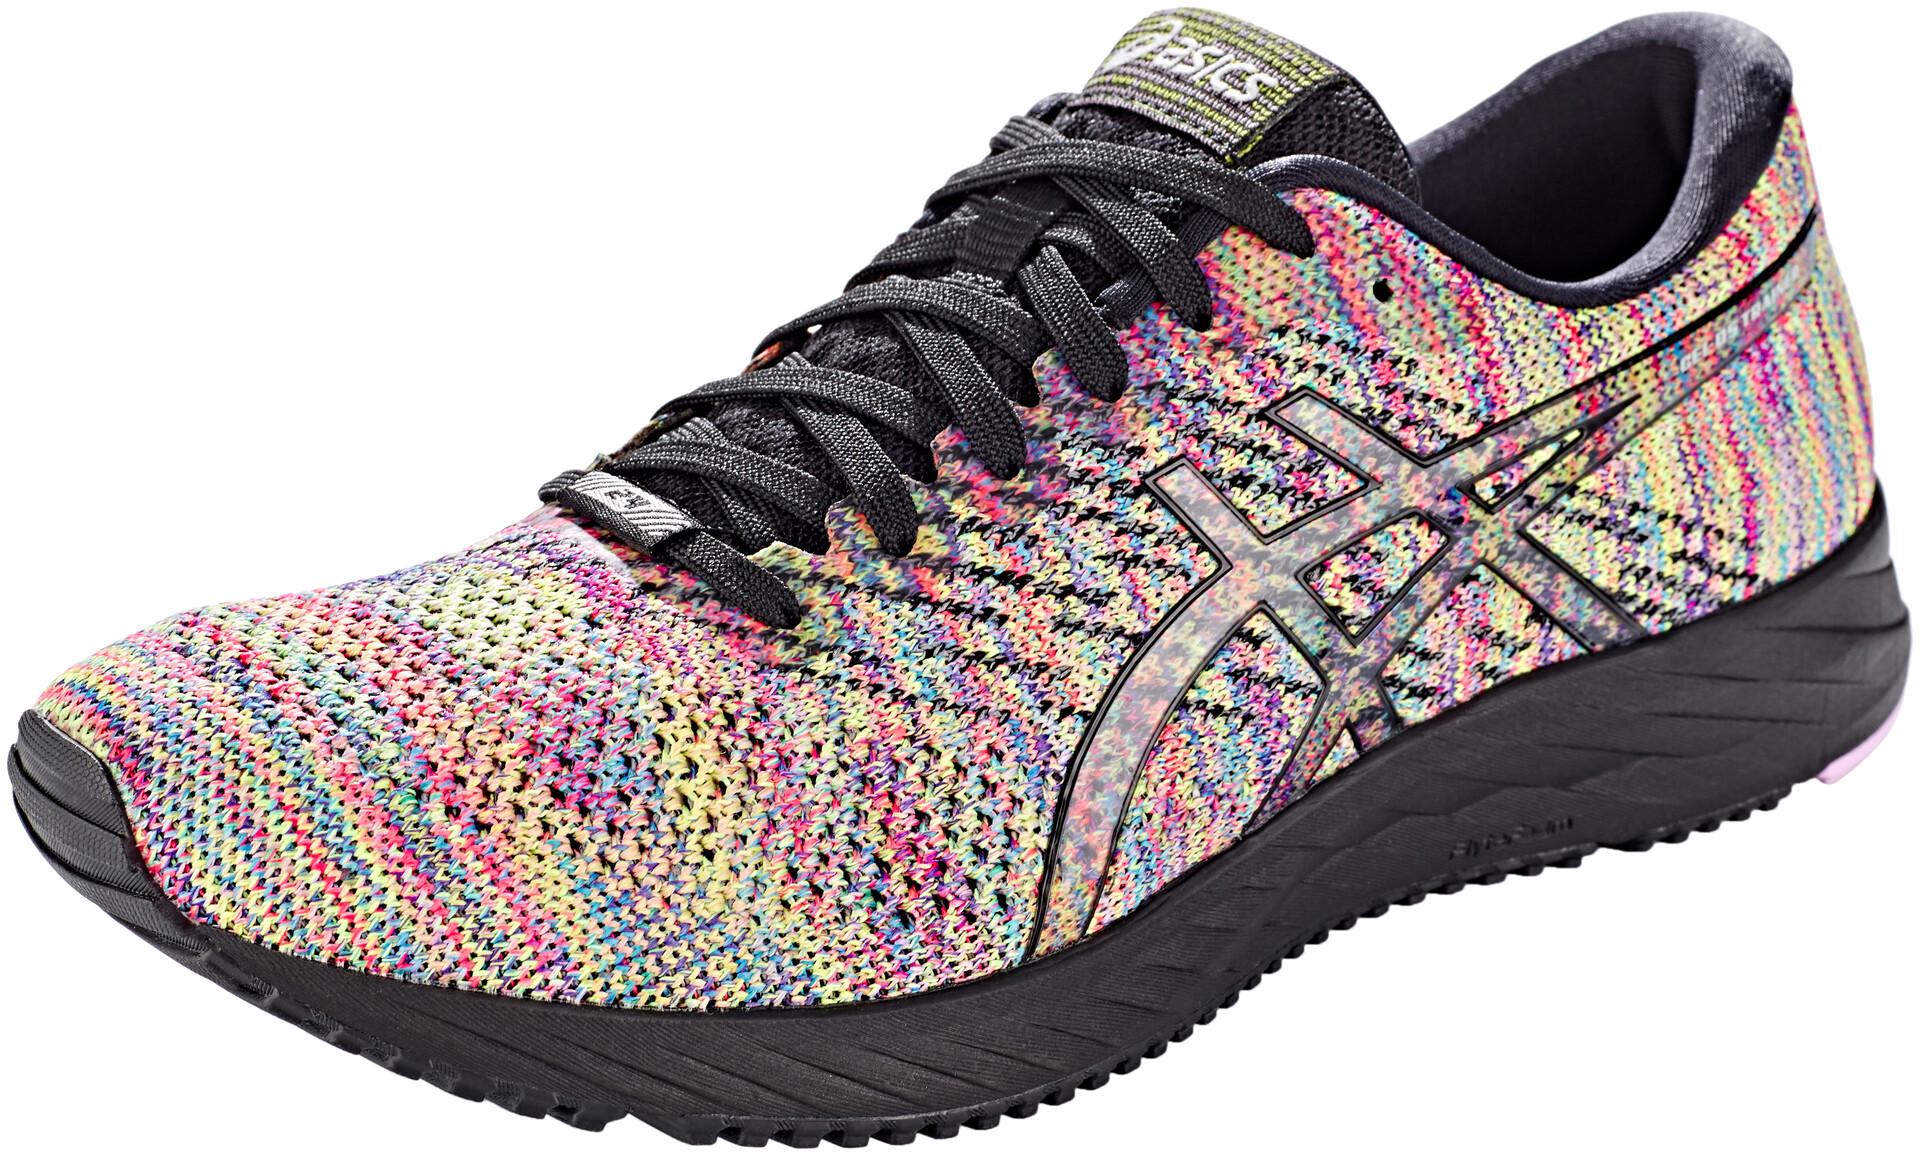 asics Gel-DS Trainer 24 Shoes Damen multi/black